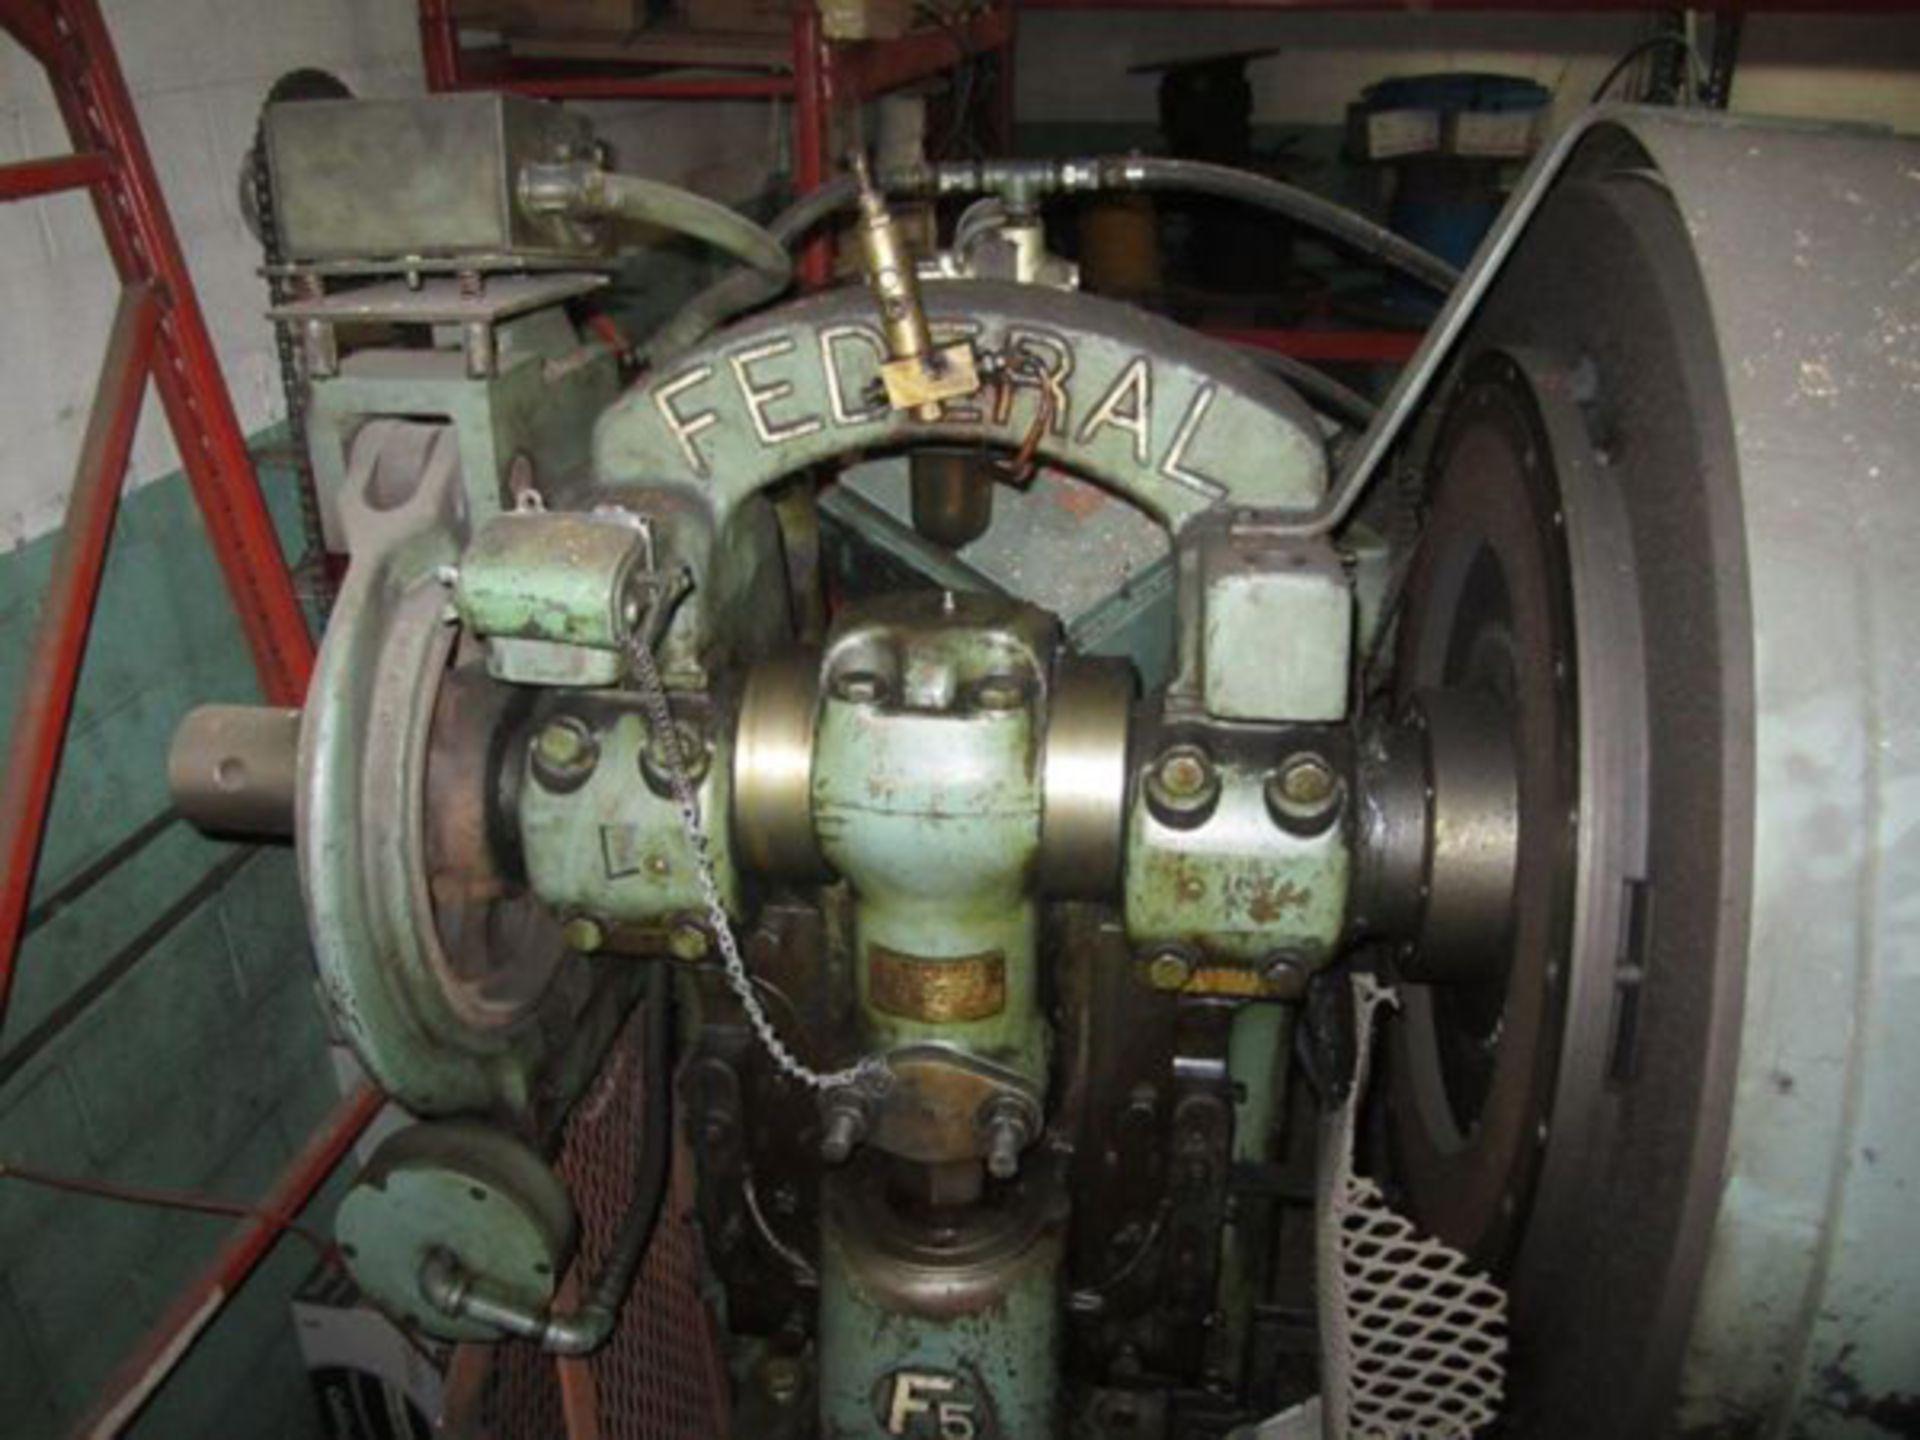 "Federal OBI Punch Press   60-Ton x 29 1/2"" x 18 1/2"", Mdl: F-5, S/N: 125400 - 6397P - Image 3 of 6"